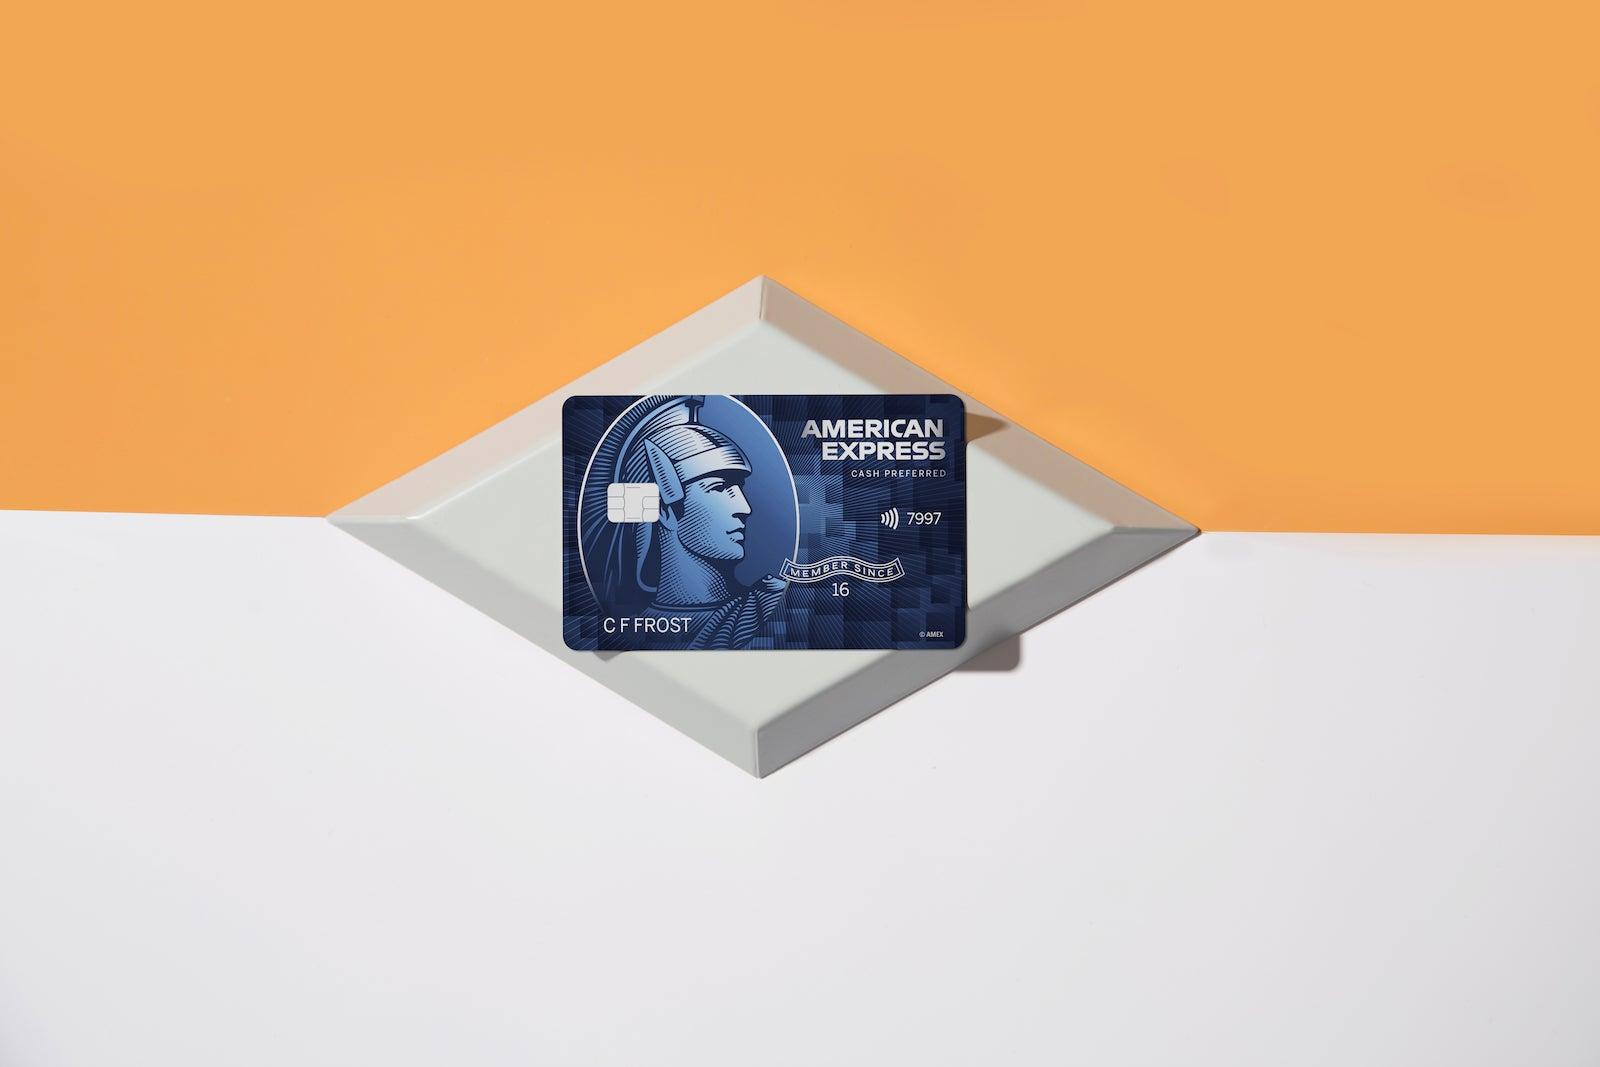 Amex Blue Cash Preferred Vs Amex Blue Cash Everyday The Points Guy